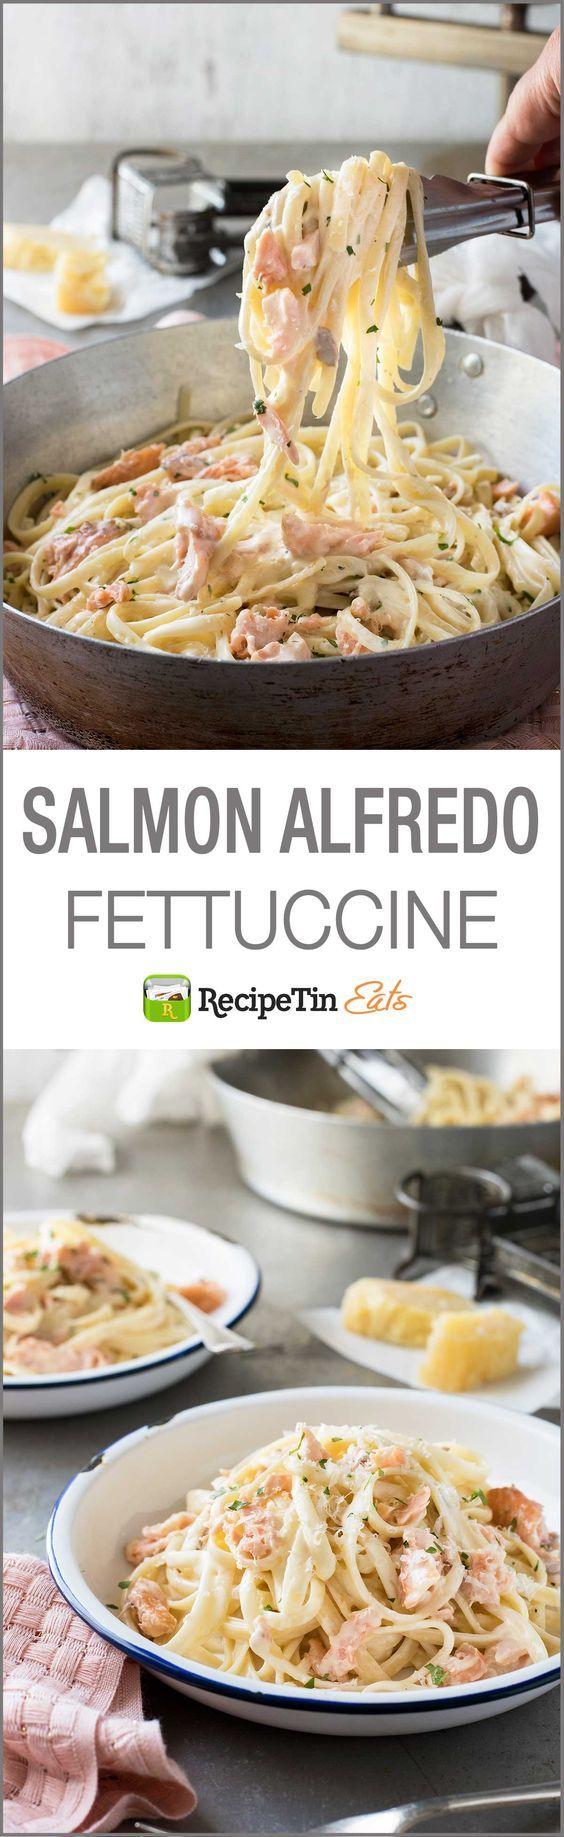 Salmon Alfredo Pasta - Fettuccine tossed in a creamy parmesan sauce and salmon, a magic combination!